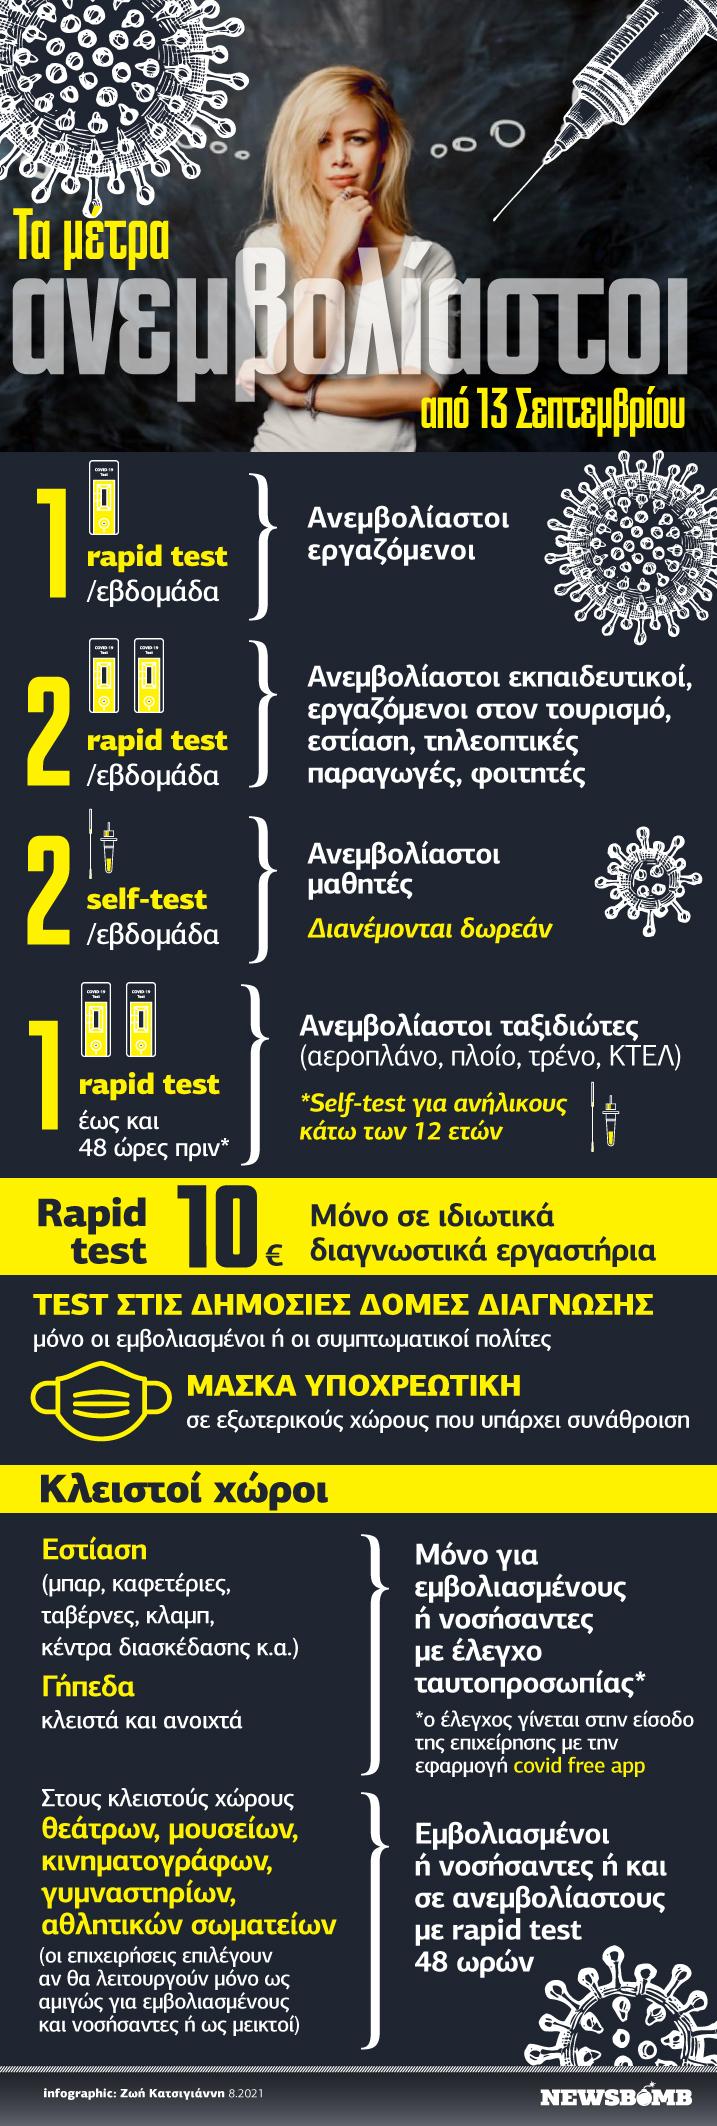 Infographic Ανεμβολίαστοι νέα μέτρα